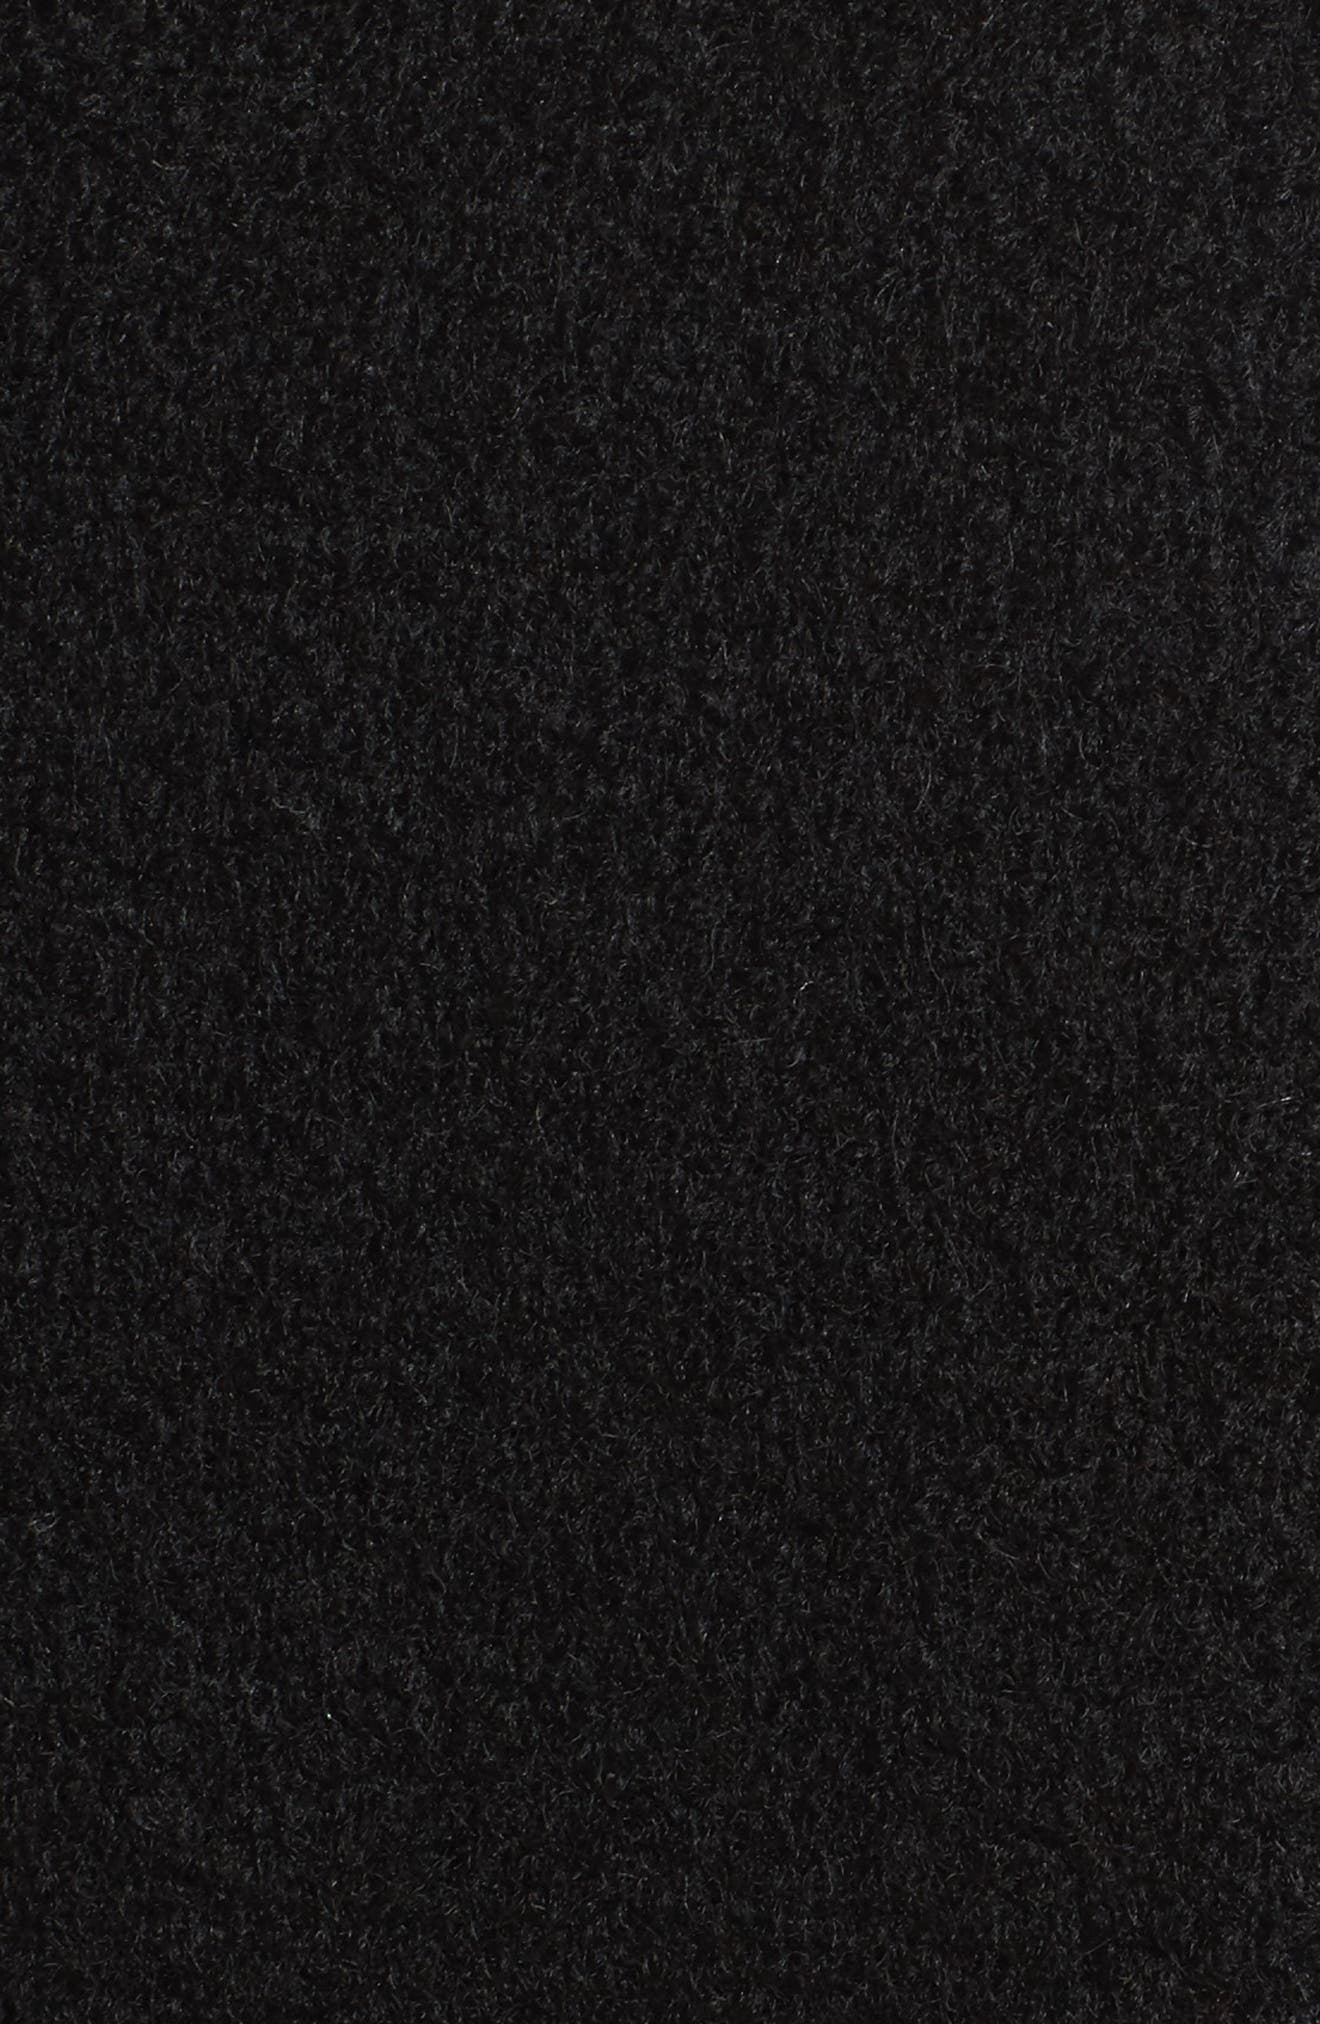 Belted Boiled Wool Blend Coat,                             Alternate thumbnail 6, color,                             001